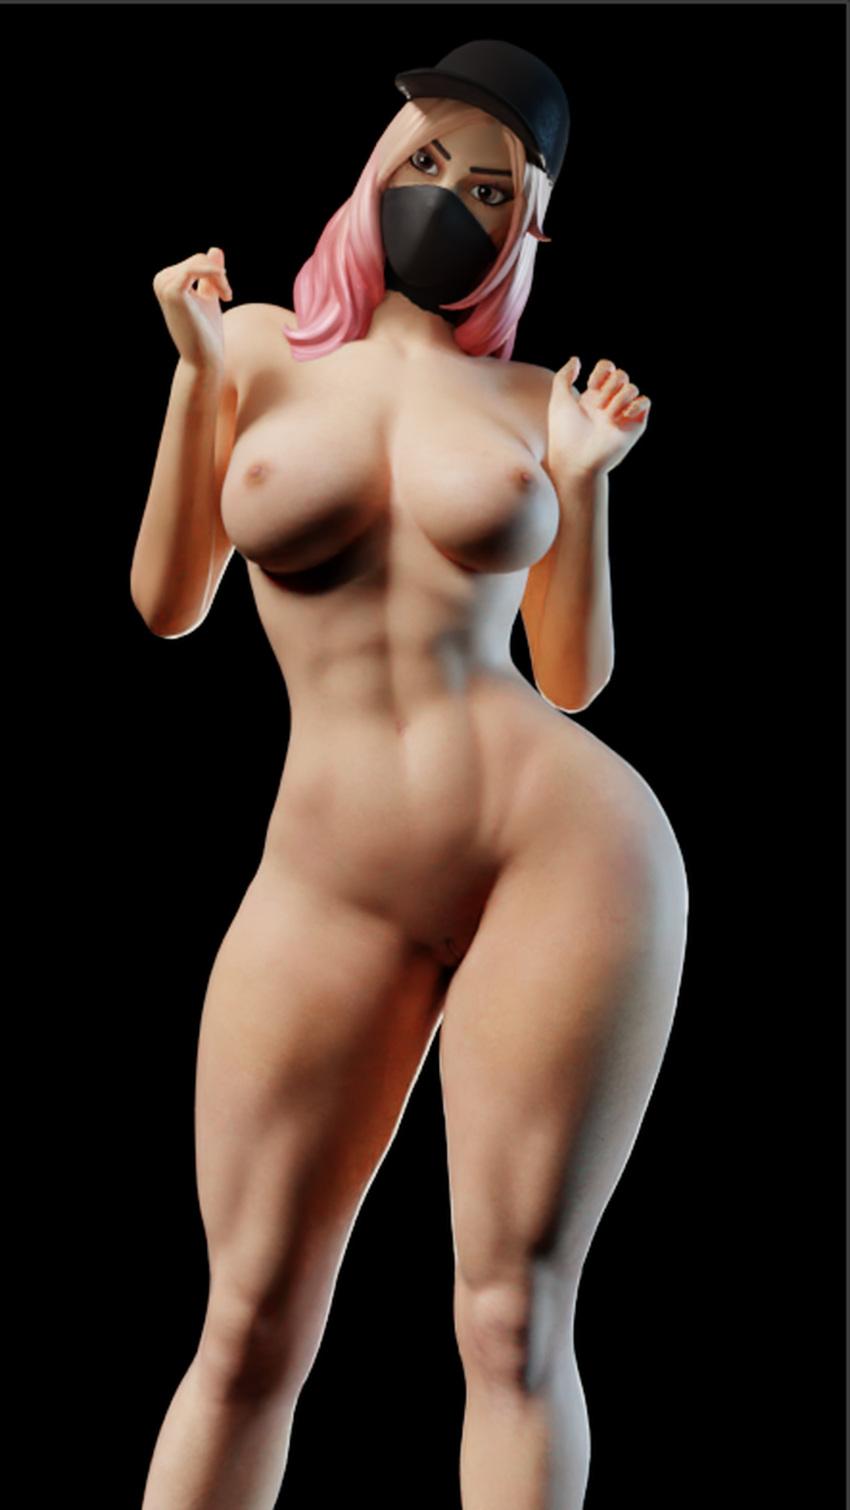 fortnite-game-porn-–-mask,-breasts,-pussy,-wotm-hat,-artwork),-hands-up.